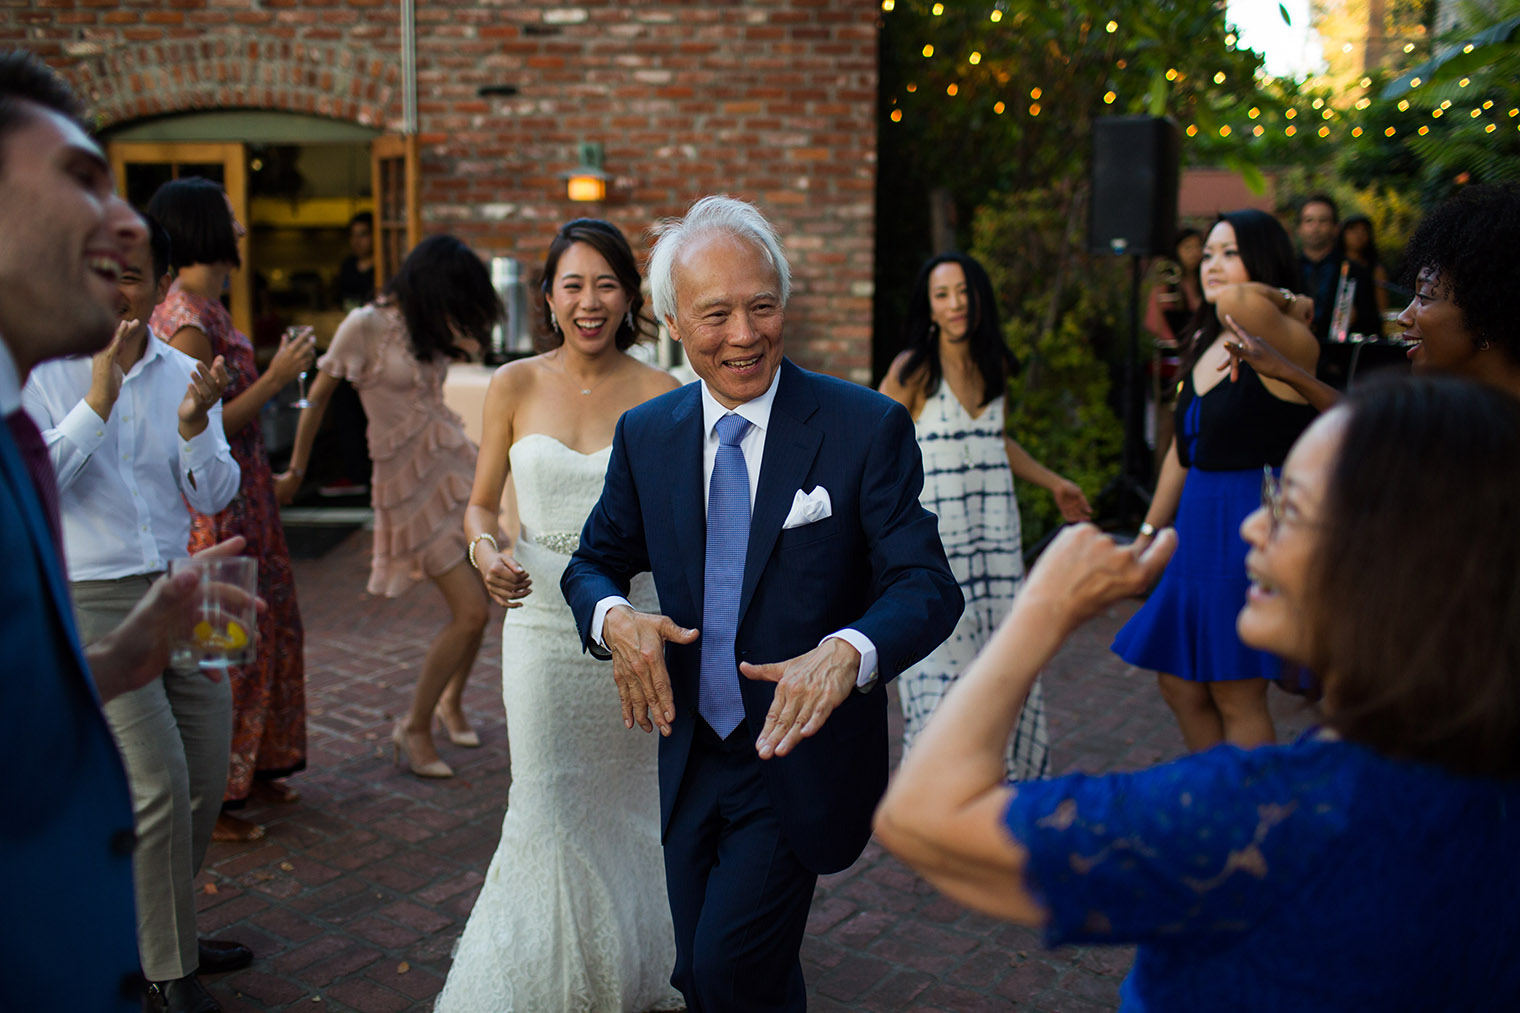 wedding reception at Happy Trails Cafe & Garden